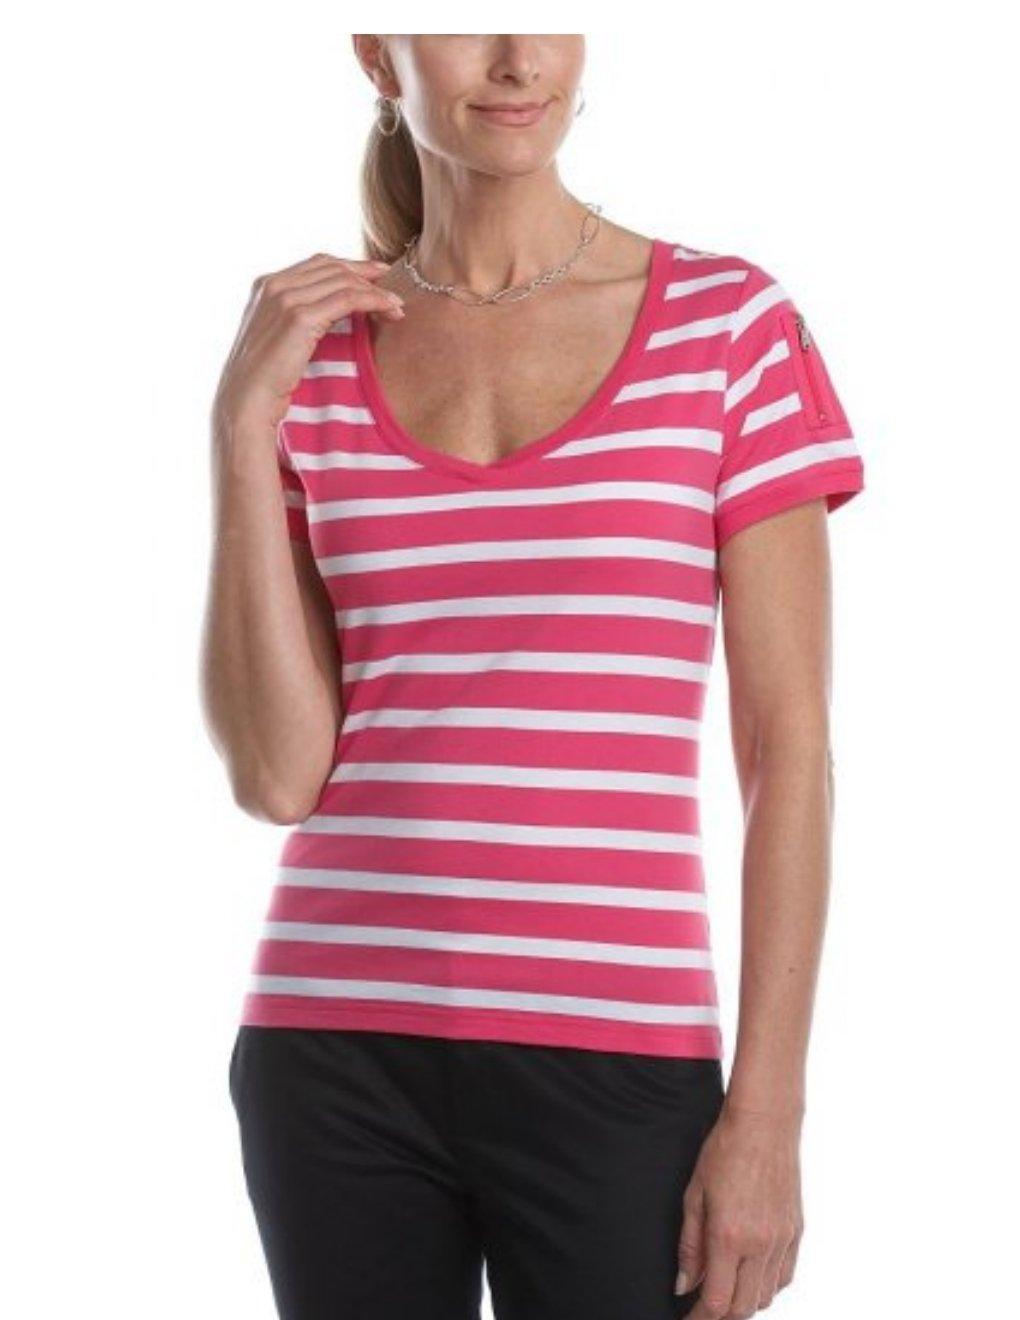 Chaps Striped Tee or Shirt Poppy White Womens Top NEW Sz Medium M